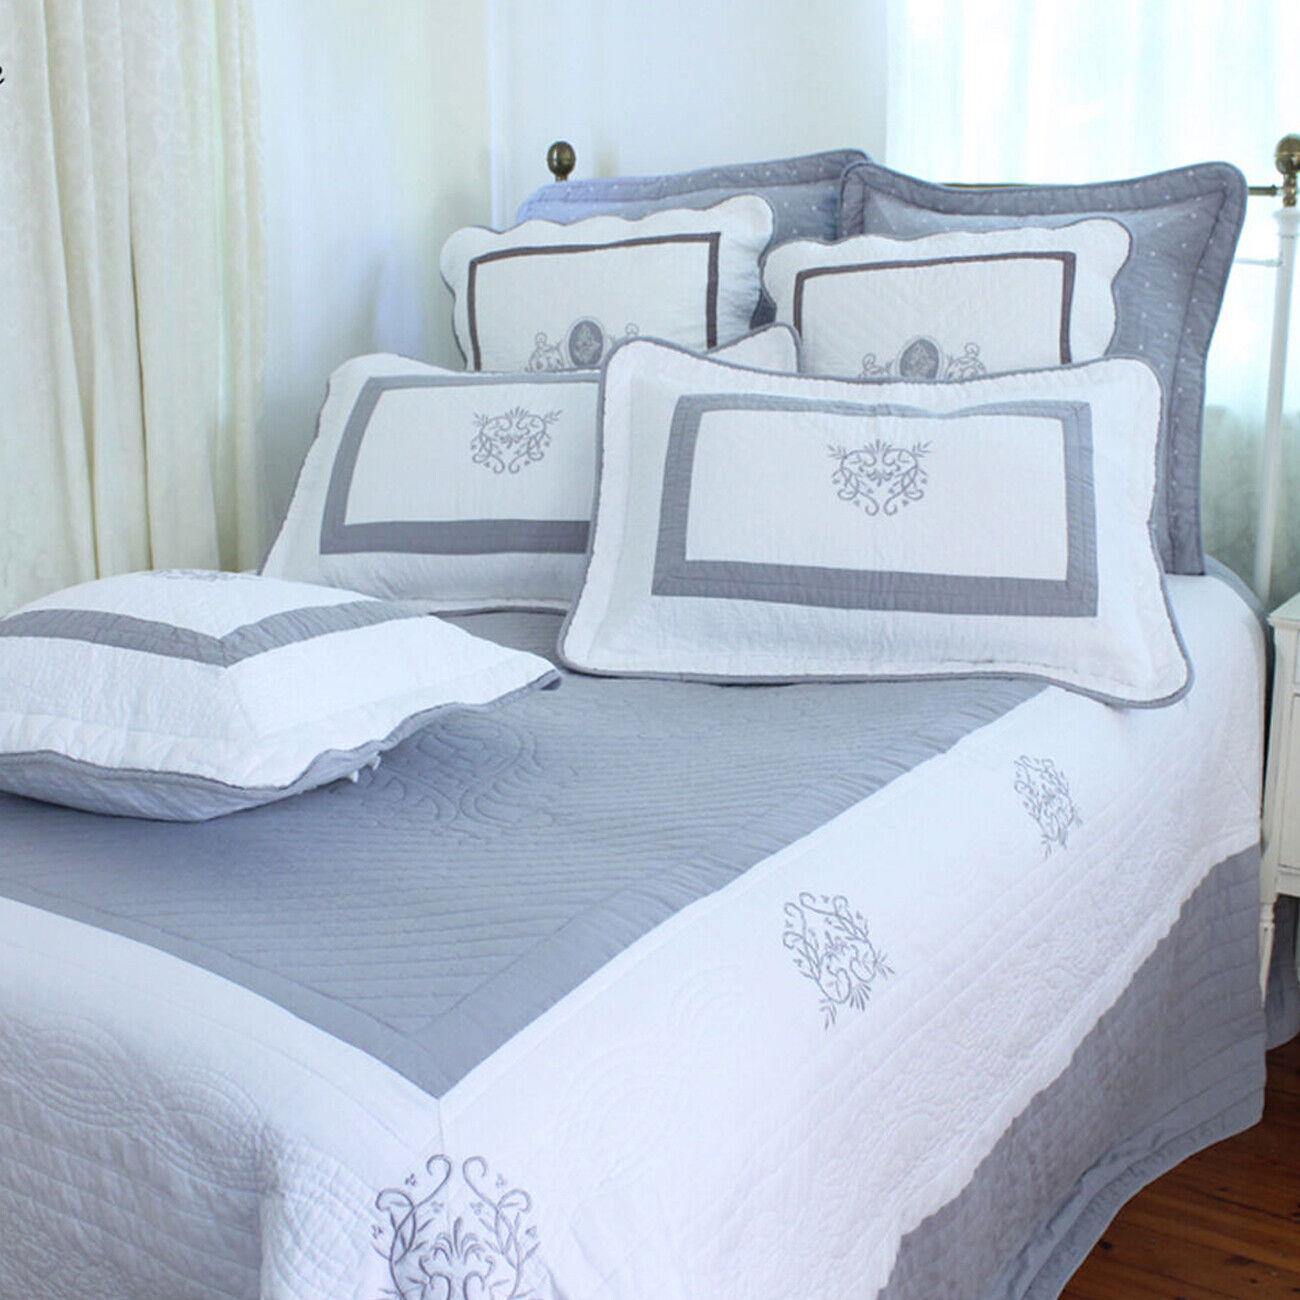 Weißhe Bedspread Set   Cotton   grau & Weiß   Embroiderot Motifs   King Queen